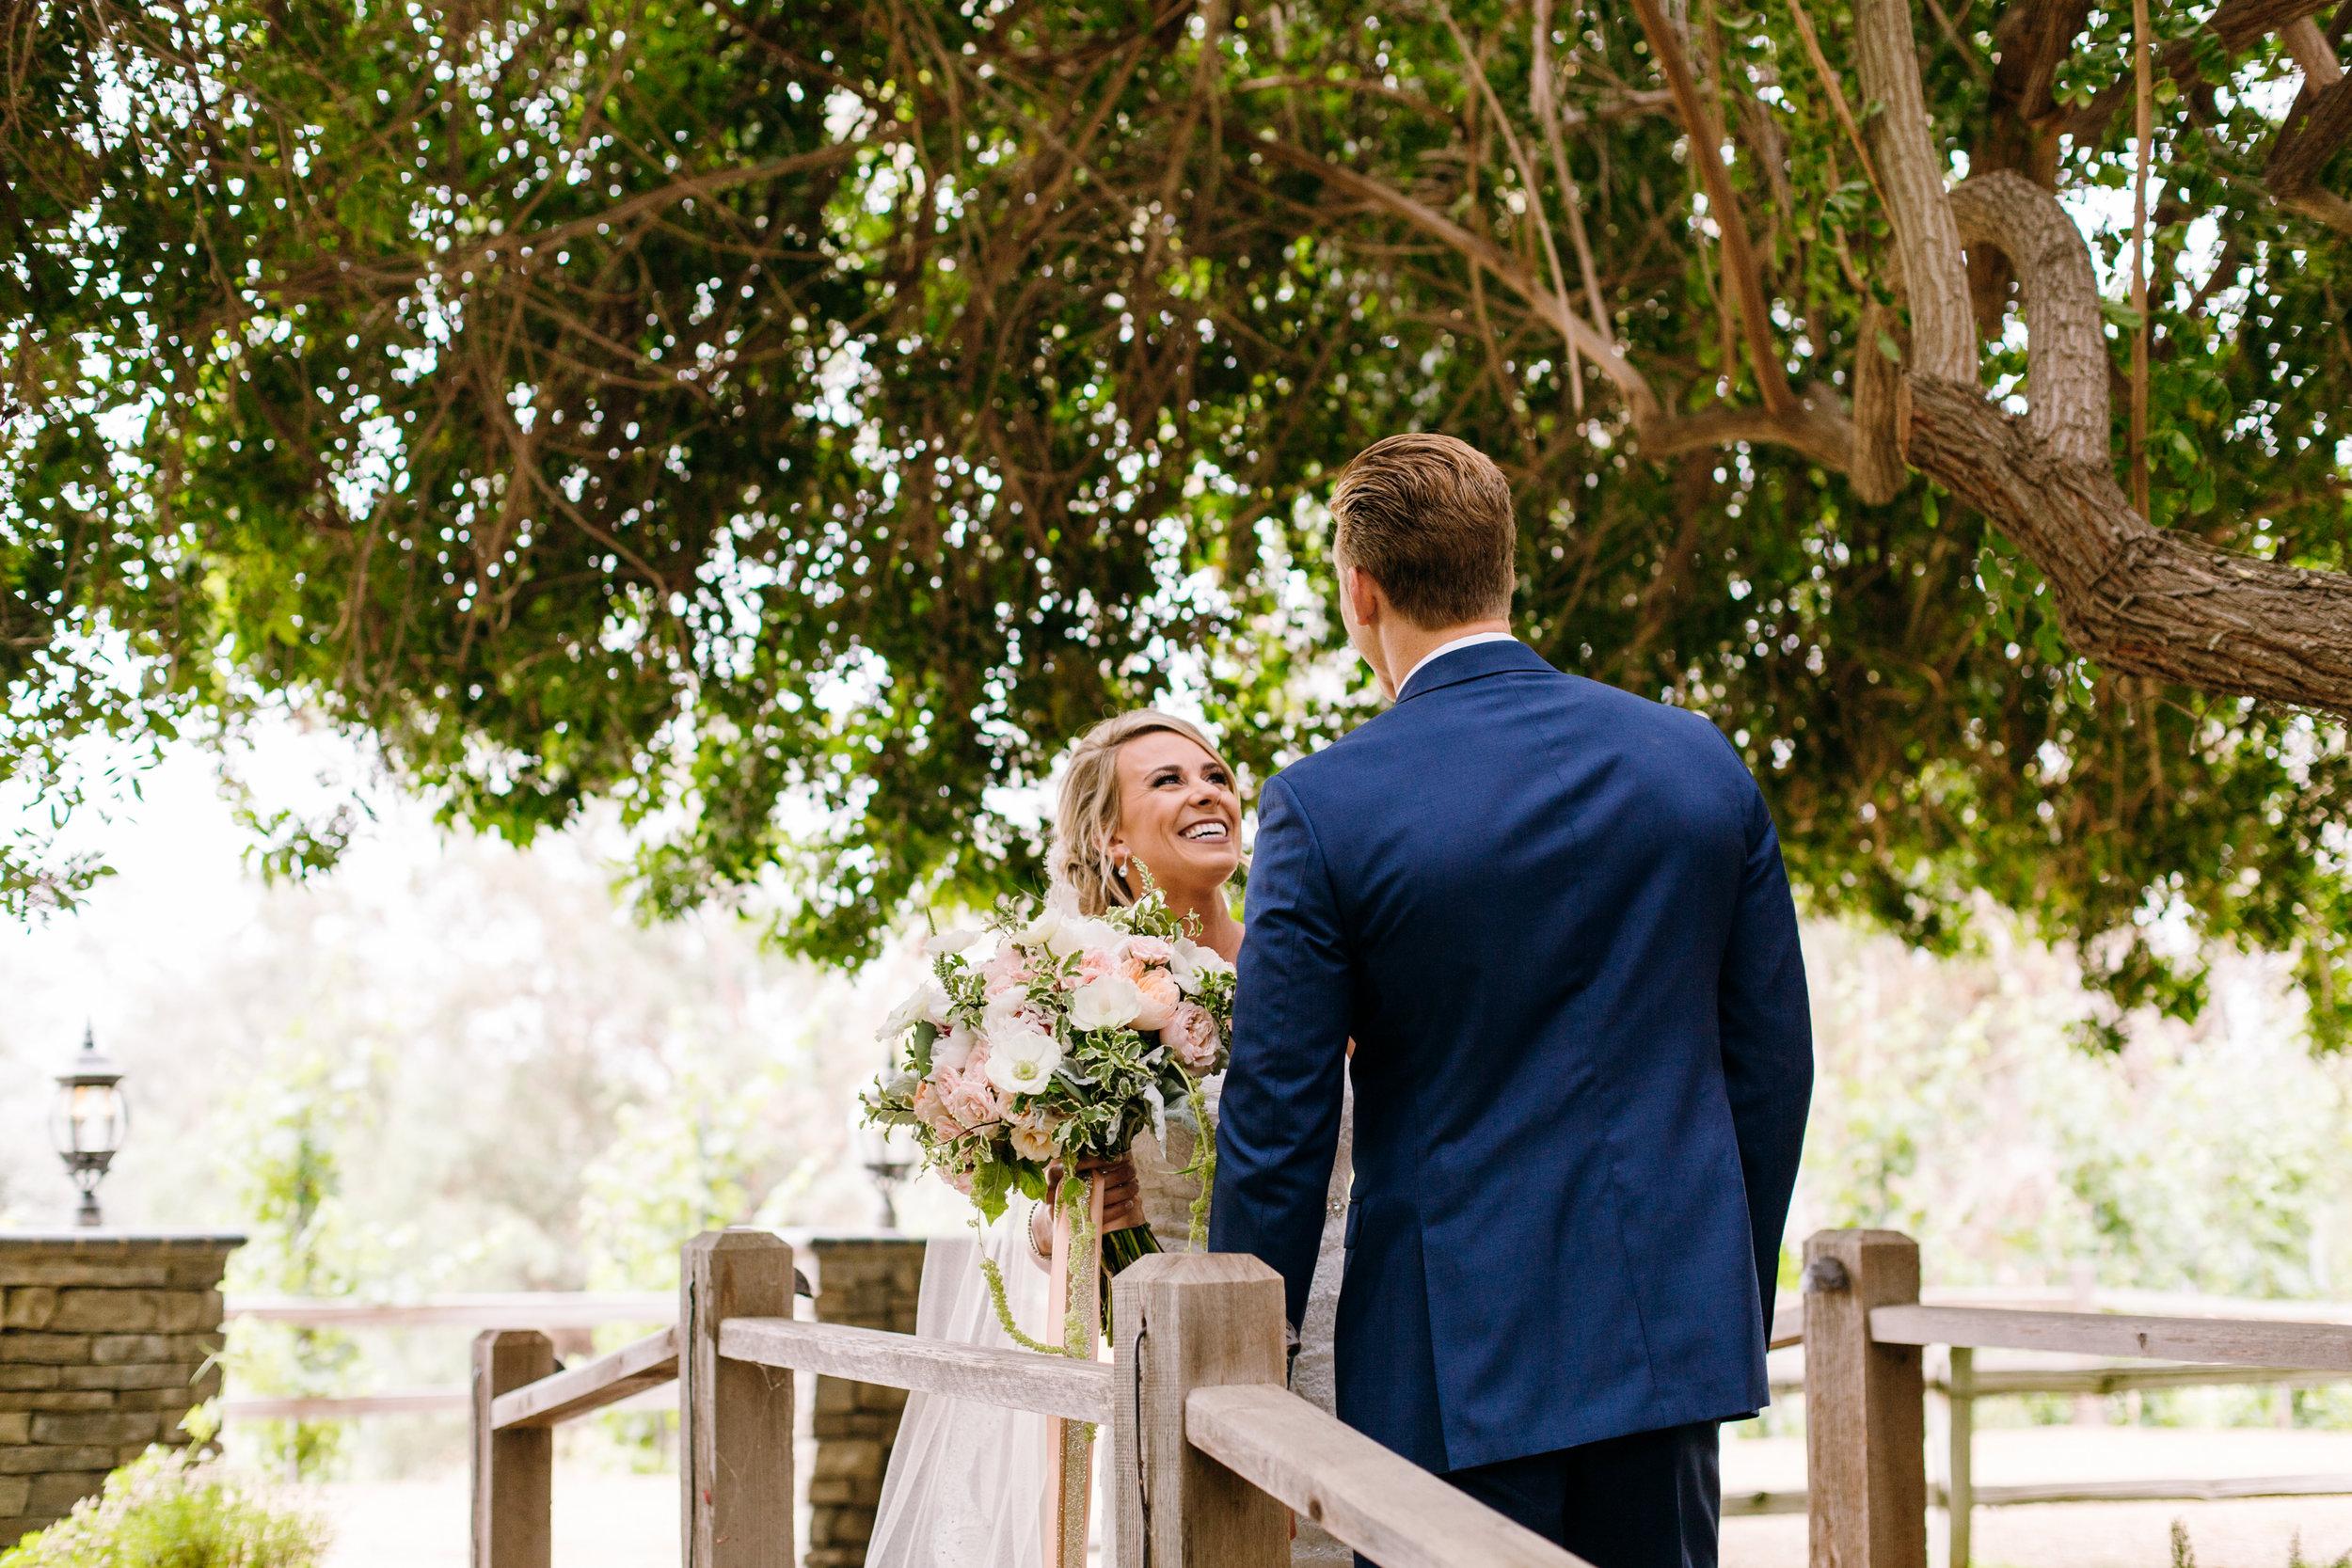 KaraNixonWeddings-LakeOakMeadows-Temecula-Wedding-17.jpg